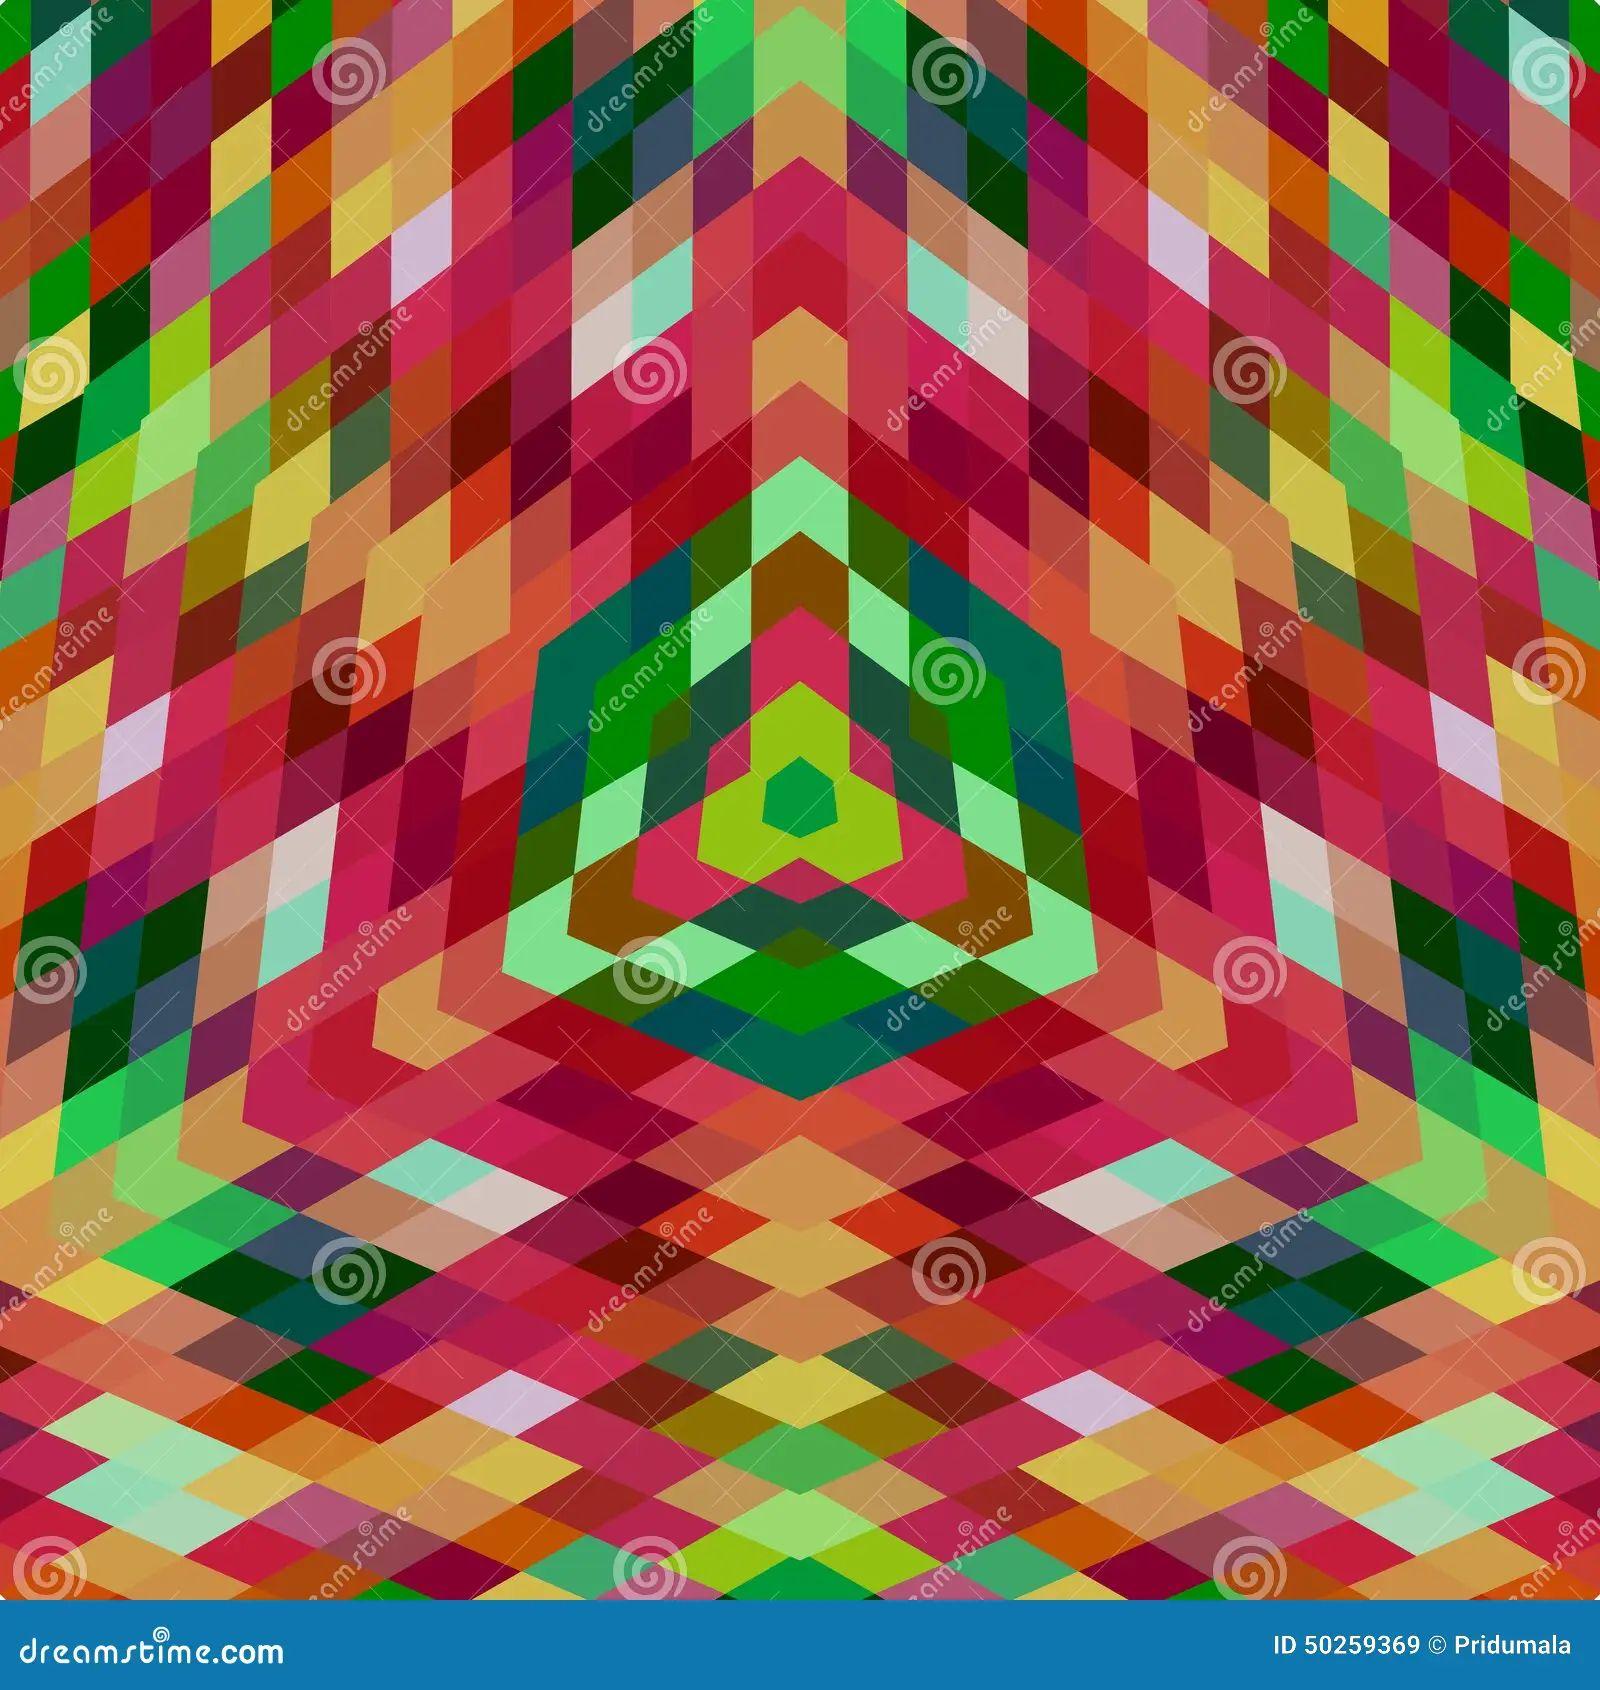 Retro vector backdrop of geometric shapes colorful mosaic